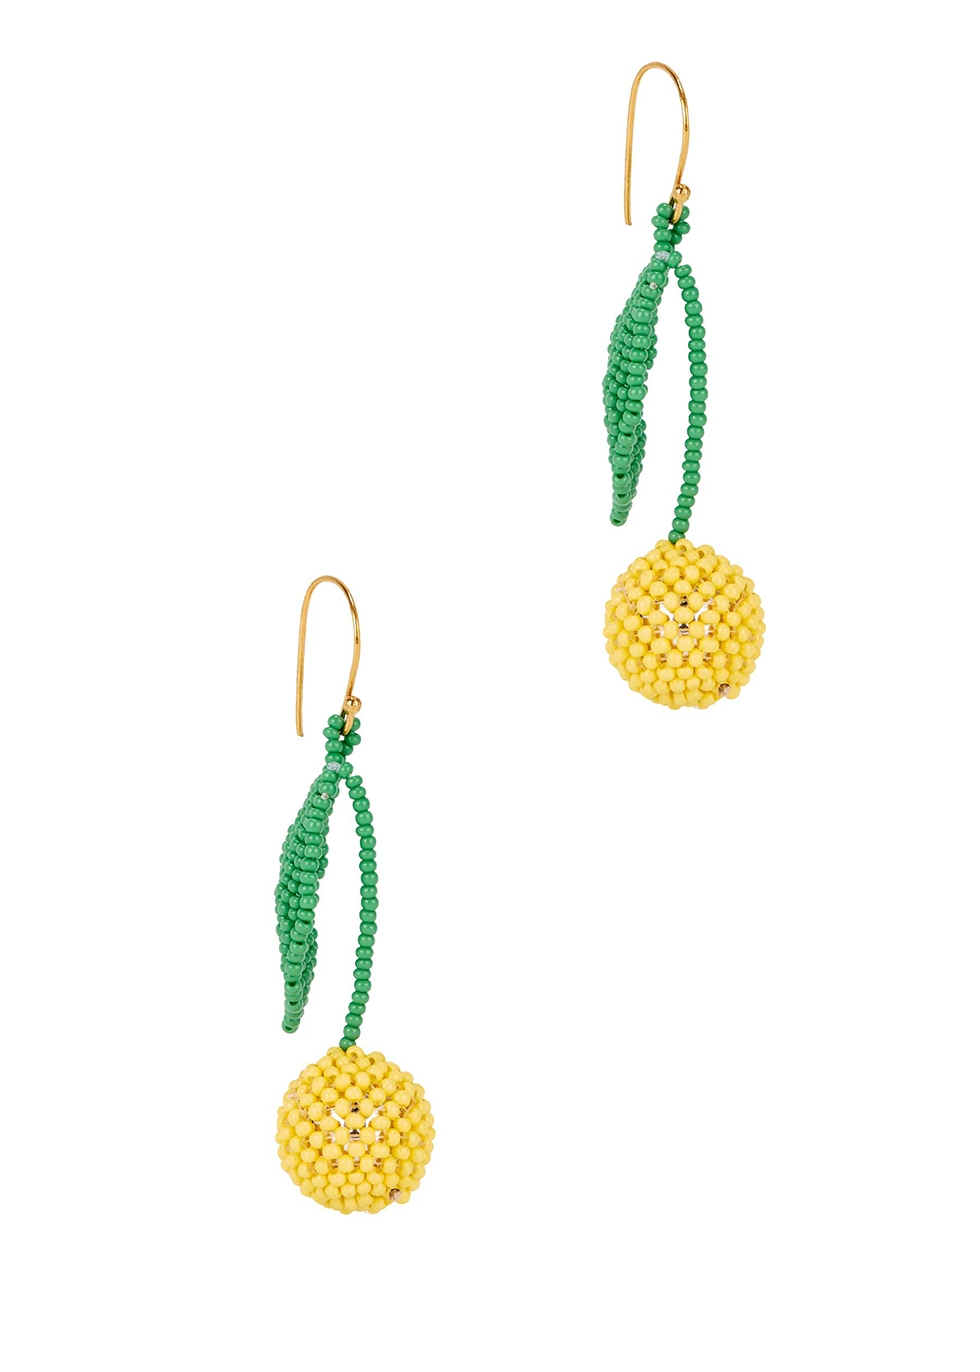 Lemons beaded drop earrings